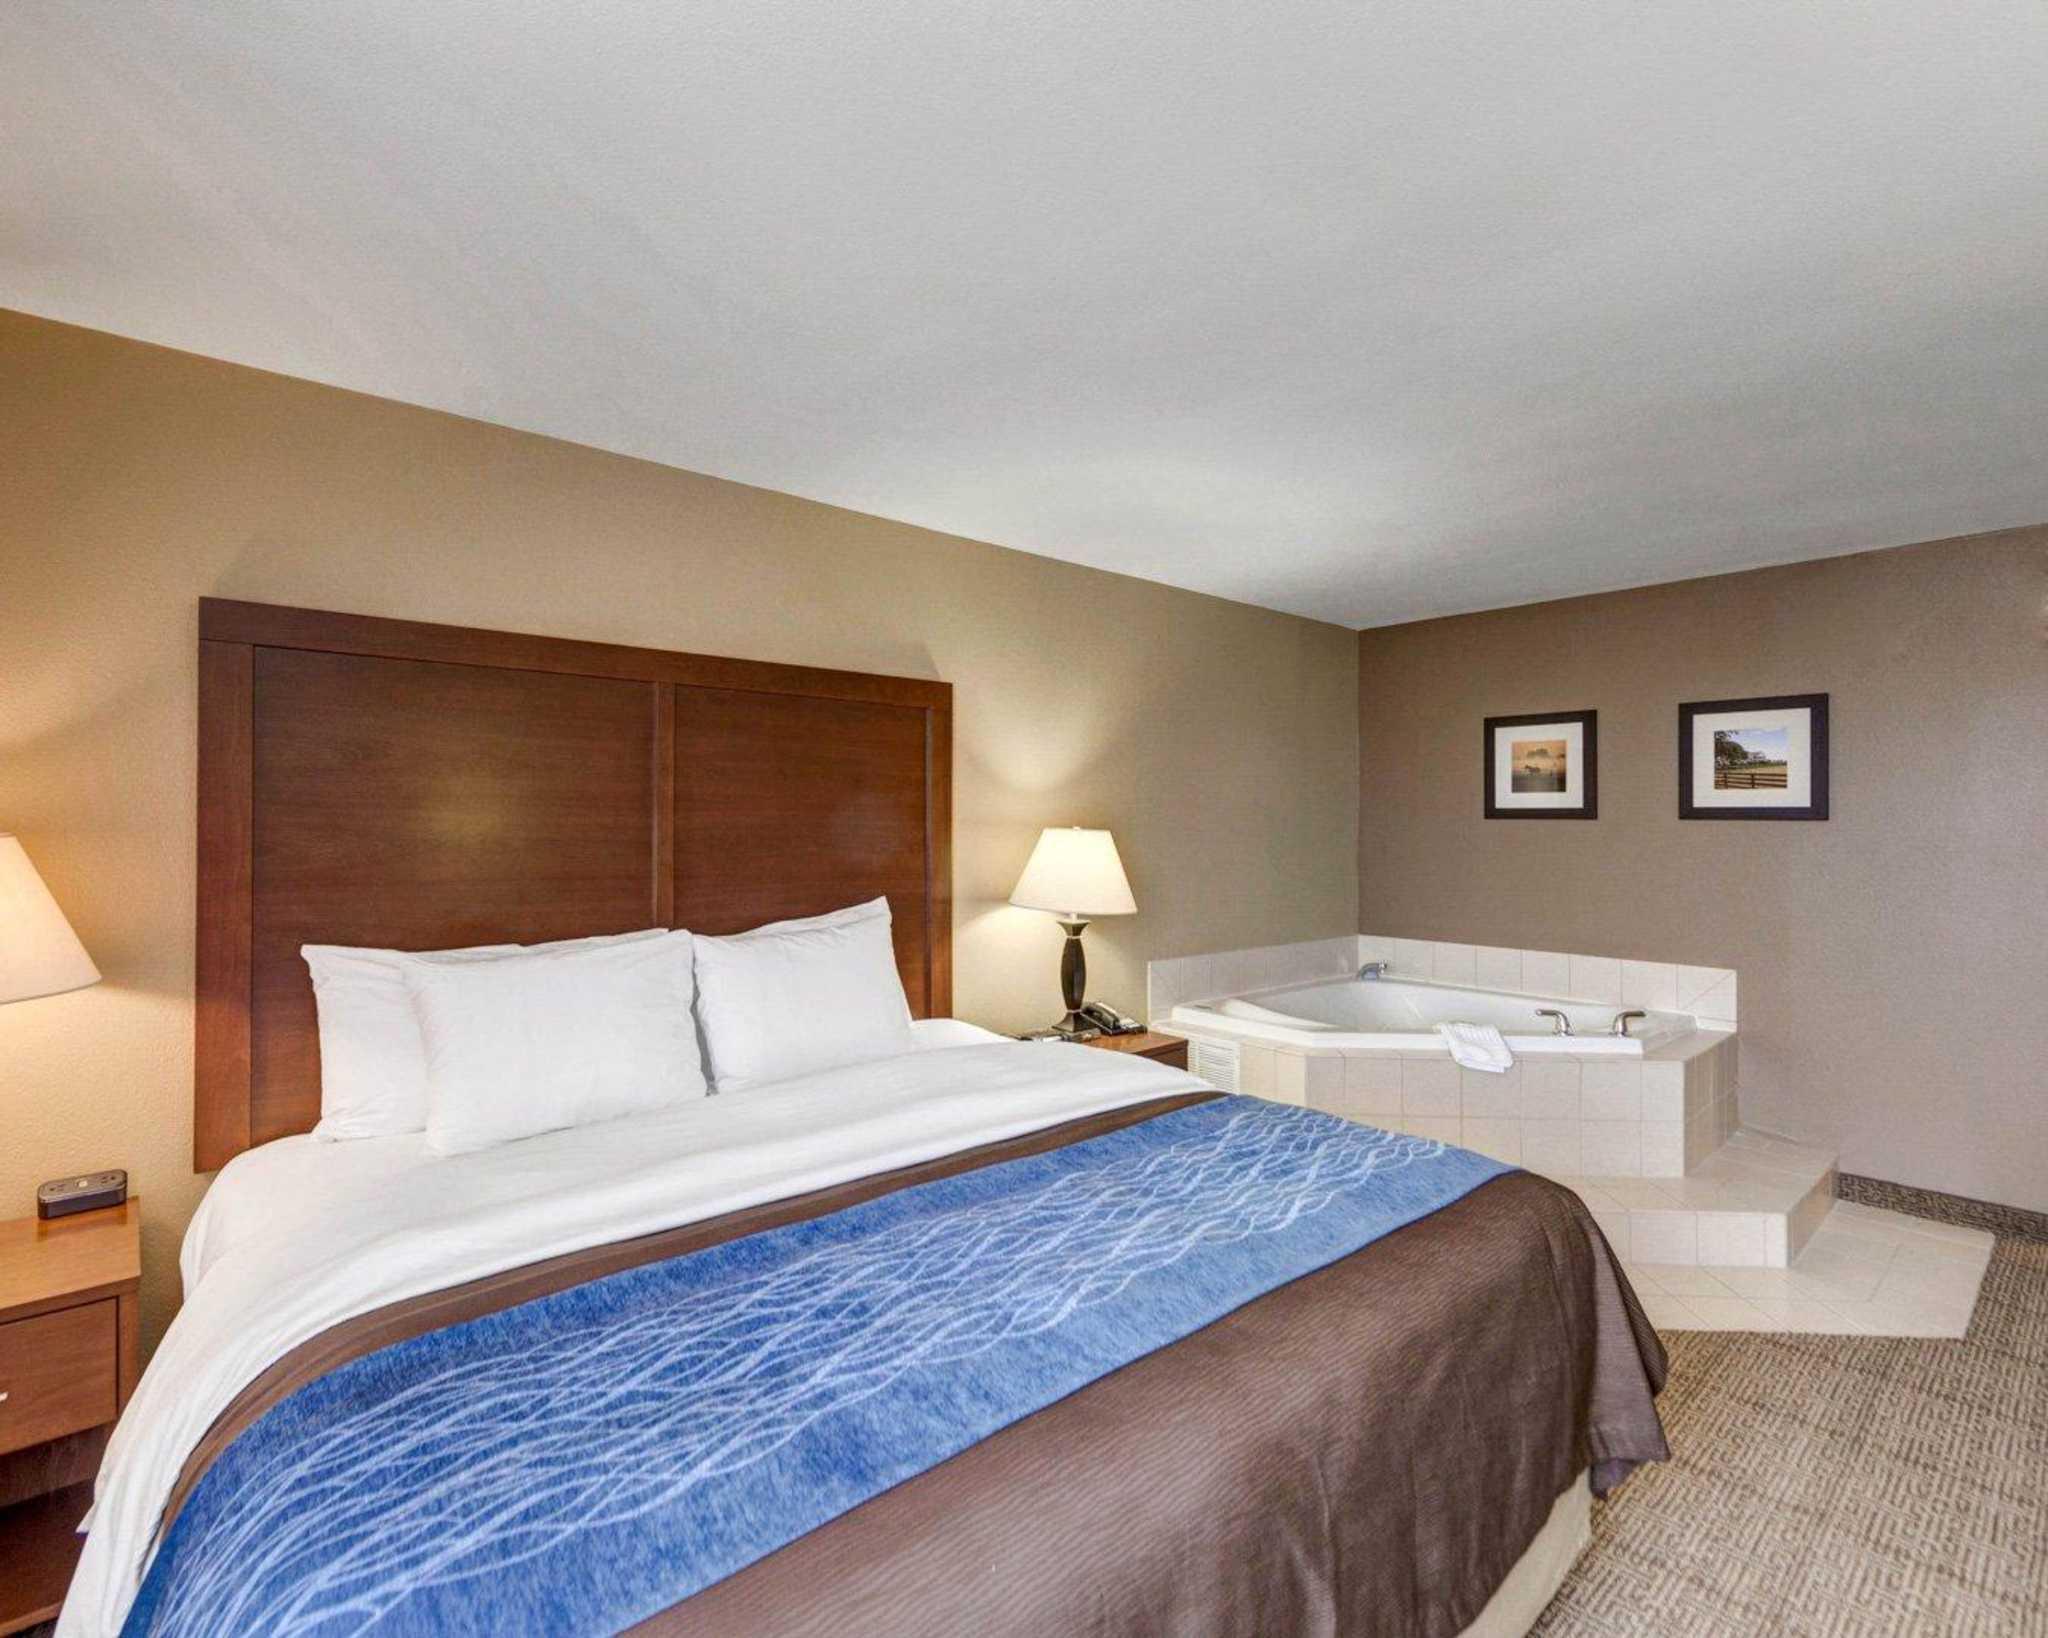 Comfort Inn & Suites Plano East image 41